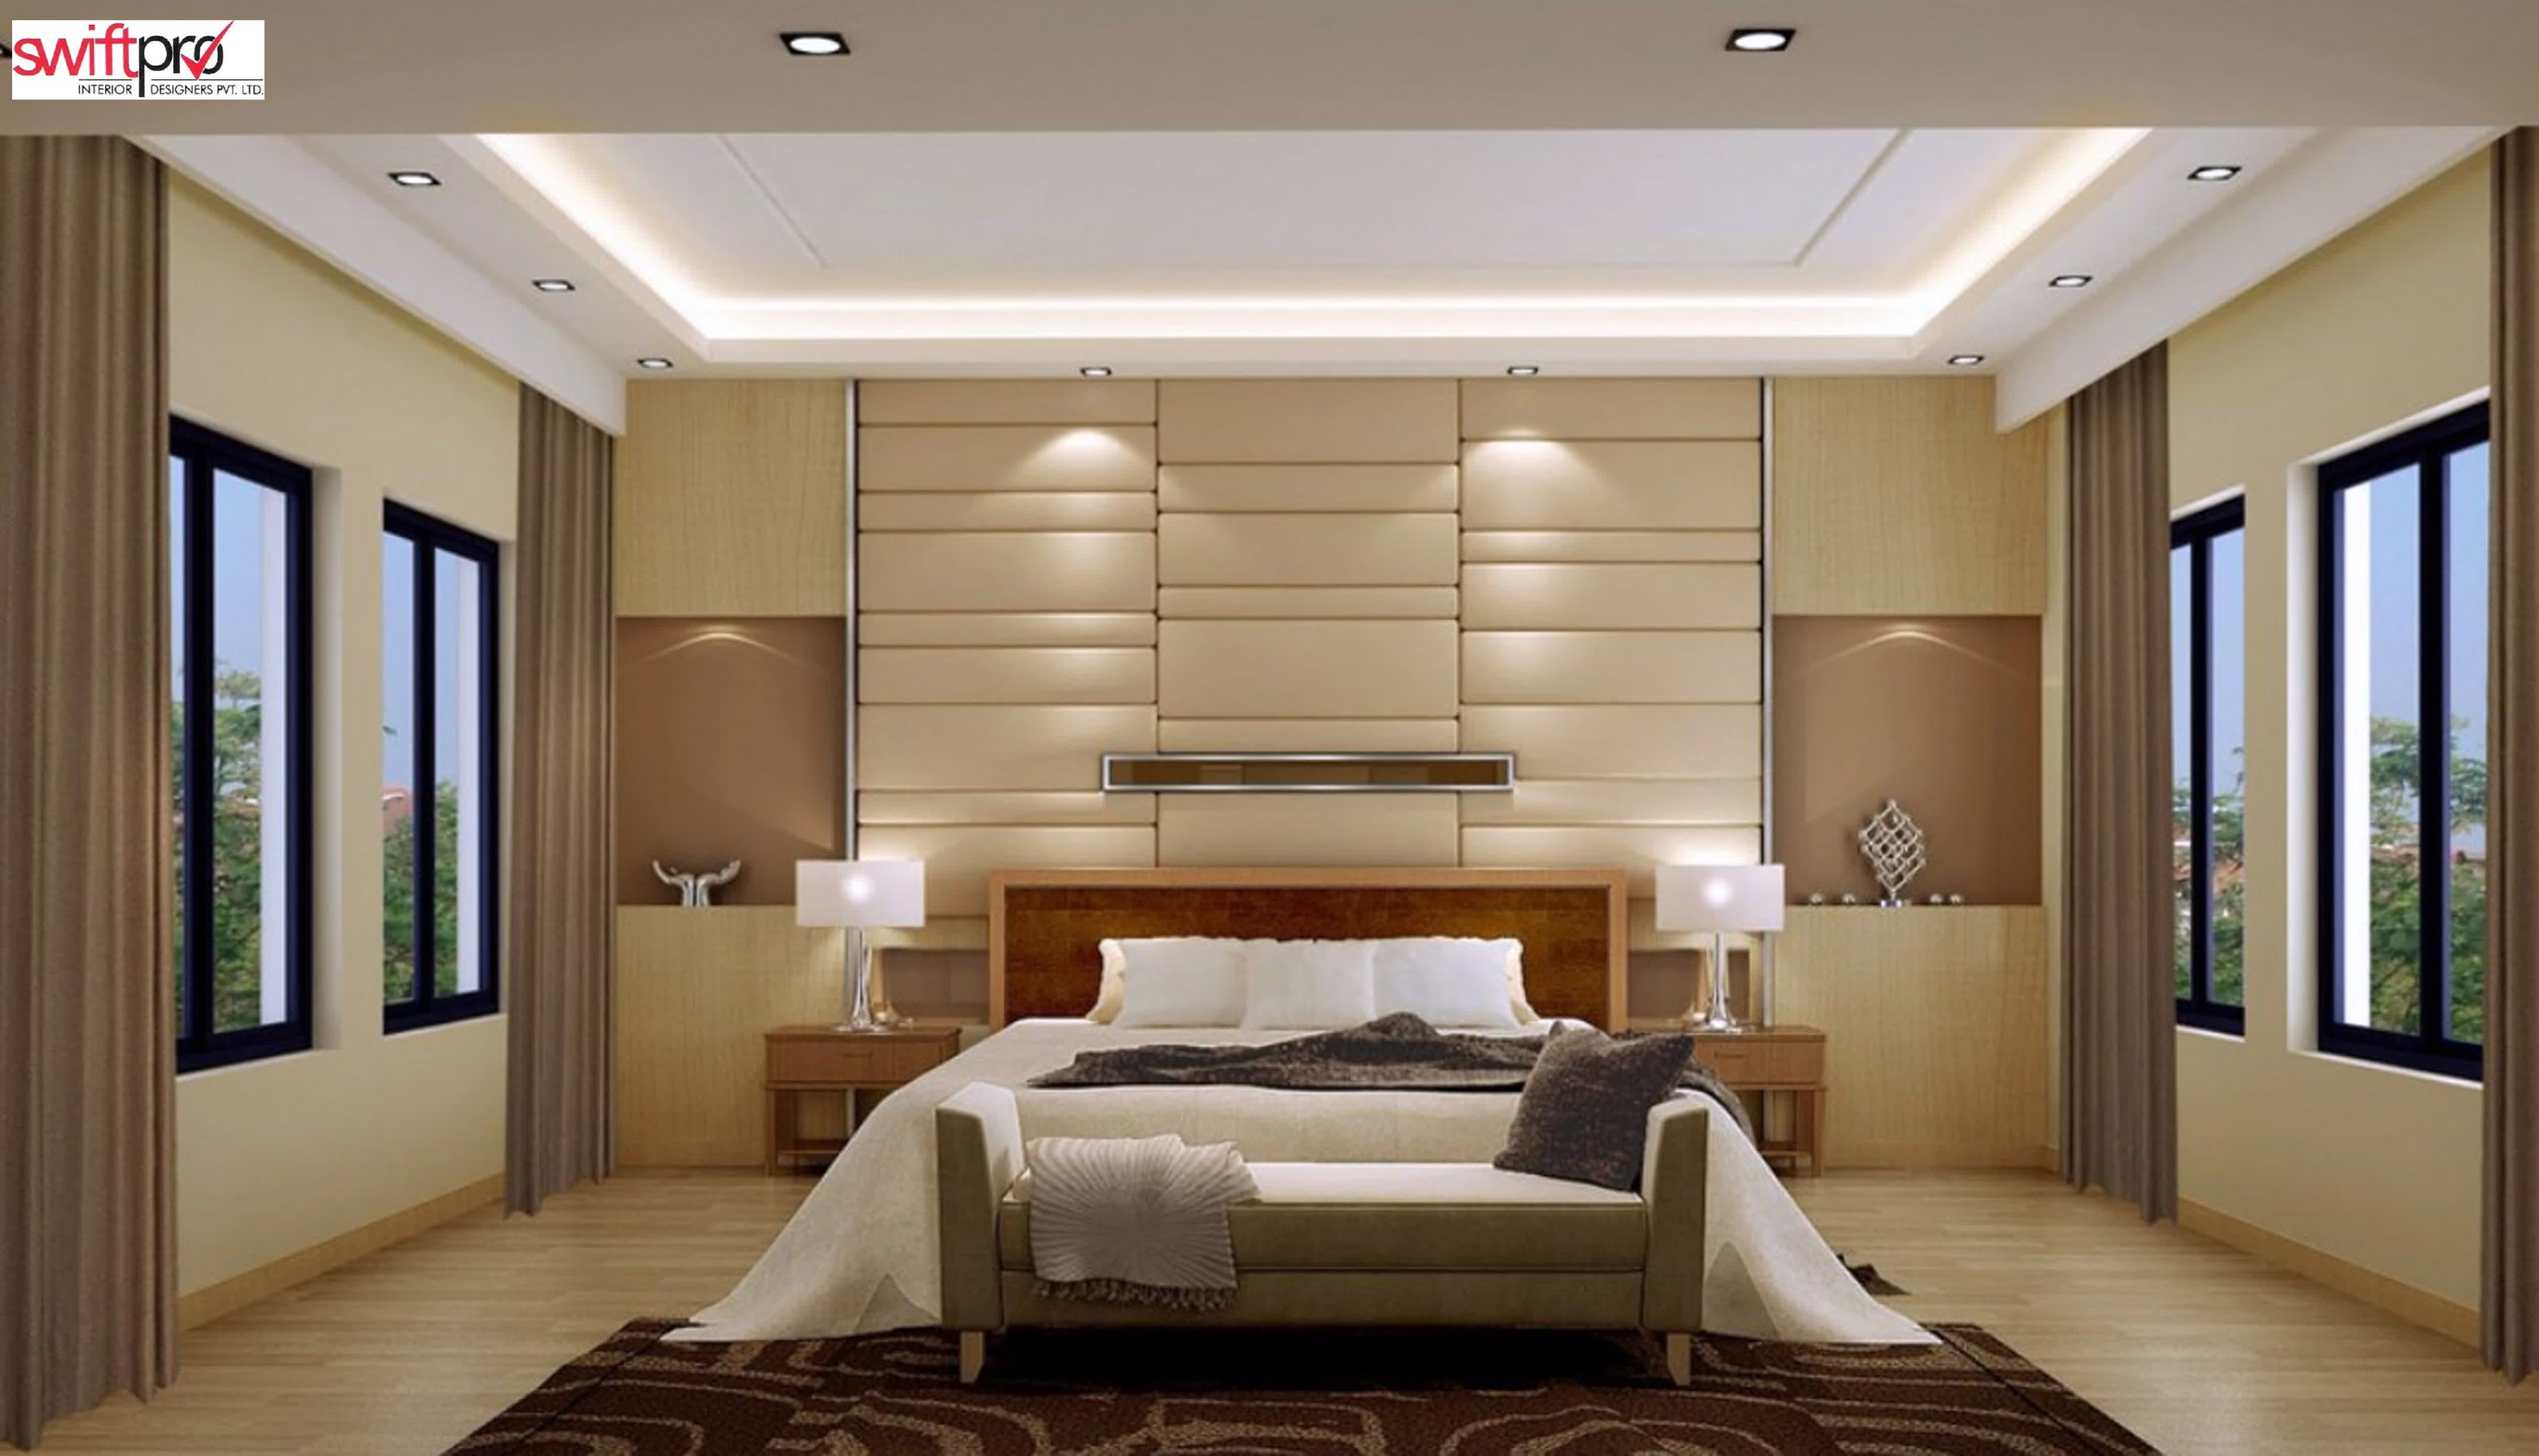 Bedroom Interior Designing Bedroom Modern Bedroom Interior Design 3D Max 3D Render  The